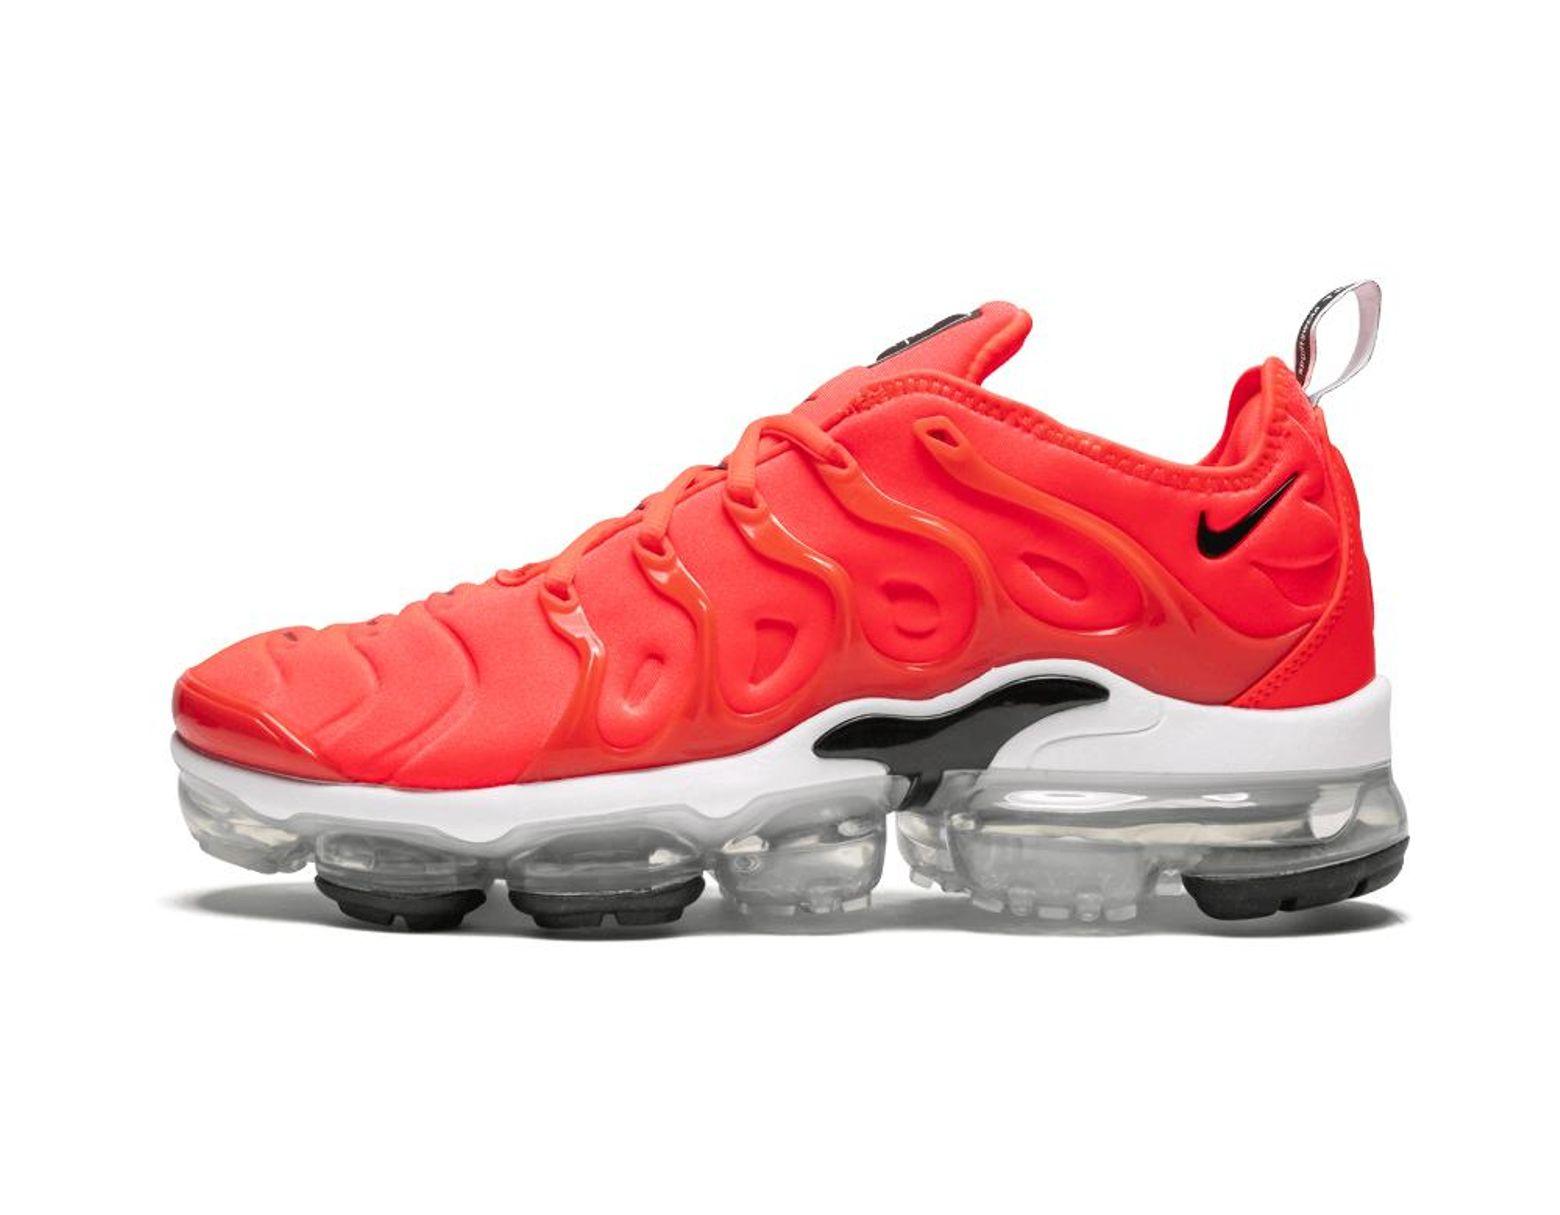 online store daa3d 940f7 Men's Red Air Vapormax Plus '